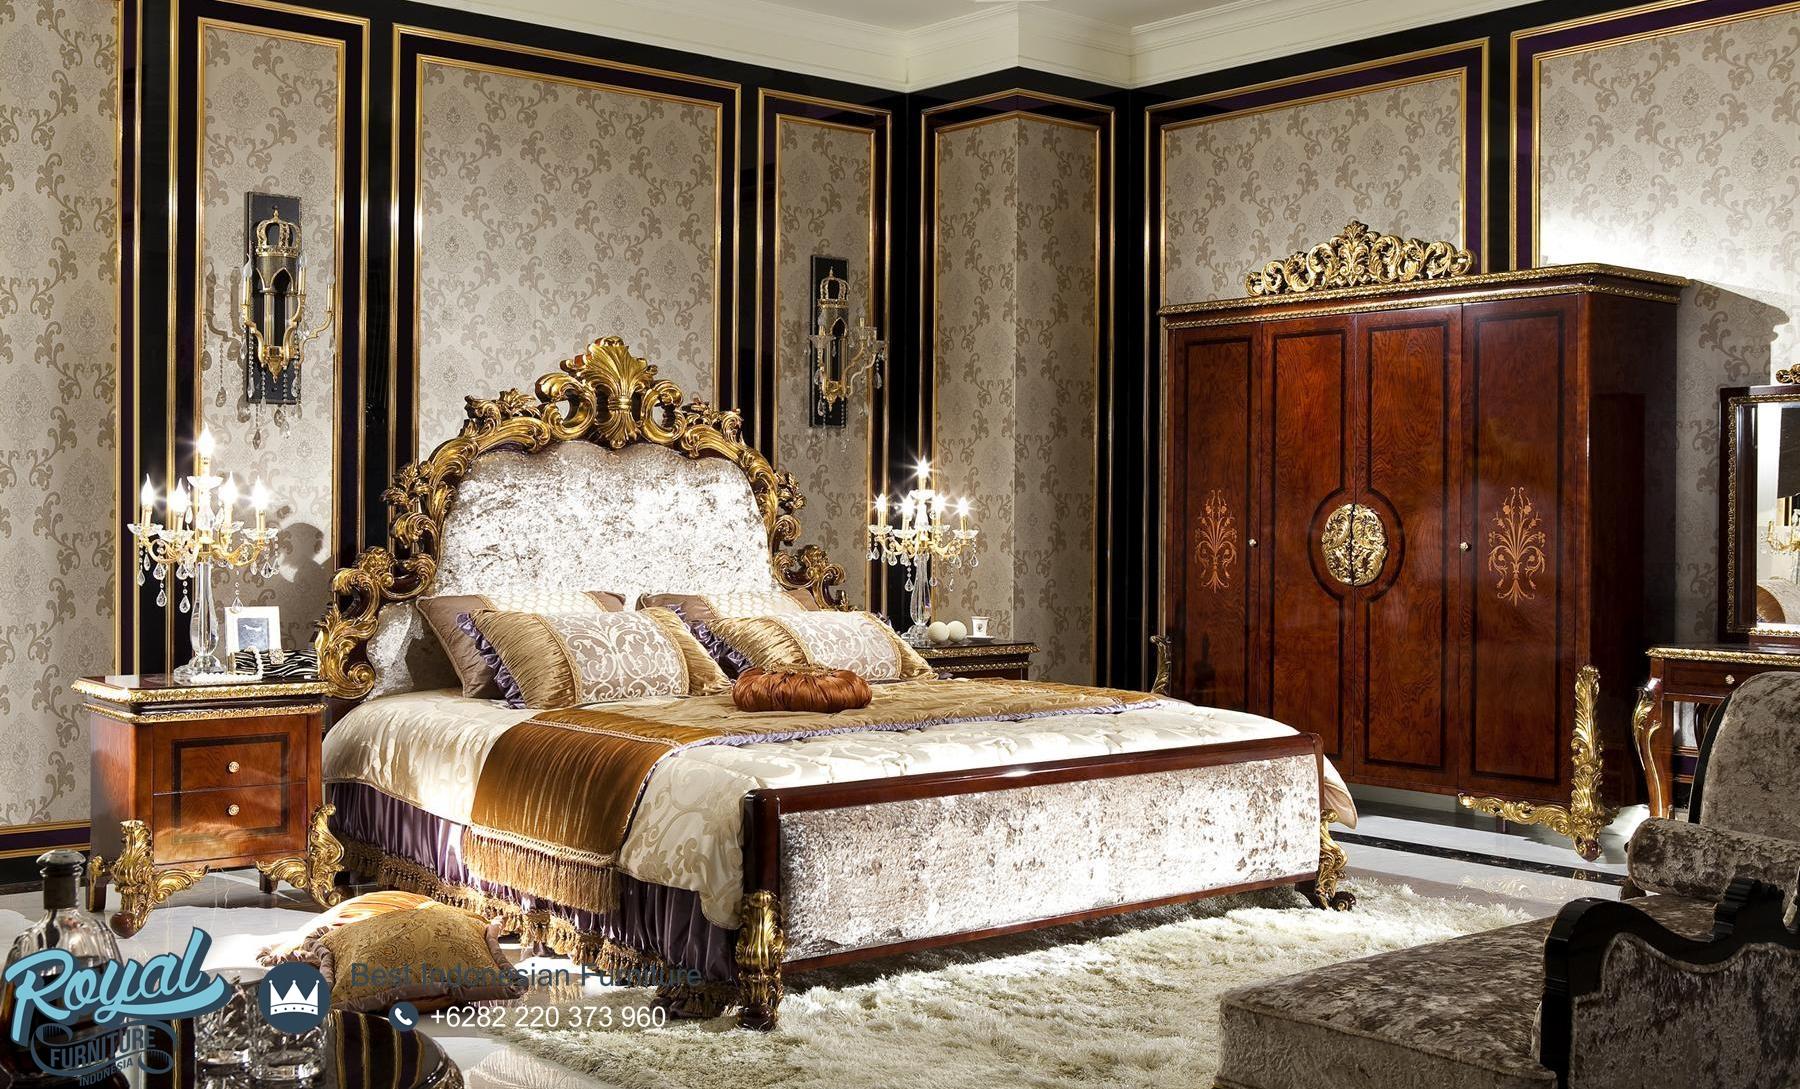 Tempat Tidur Jati Klasik Ukir Jepara Luxury Davinci Style Terbaru, tempat tidur jati, tempat tidur kayu jati, tempat tidur jepara terbaru, kamar set jati jepara terbaru, harga 1 set tempat tidur jepara murah, set tempat tidur pengantin, model kamar set jati minimalis, model kamar set pengantin terbaru, tempat tidur jepara terbaru 2020, kamar set mewah ukir jepara, tempat tidur mewah modern, tempat tidur mewah ukir jepara, tempat tidur kayu mewah, tempat tidur ukiran kayu jati, harga tempat tidur jati satu set, jual tempat tidur mewah ukiran jepara, desain kamar tidur mewah klasik, kamar set pengantin terbaru, set kamar tidur mewah, set kamar tidur klasik, kamar tidur ukir klasik jepara terbaru, set kamar tidur jati, harga tempat tidur mewah modern, kamar tidur mewah elegan, tempat tidur mewah warna gold, set kamar tidur minimalis, toko mebel jepara, toko furniture jepara, royal furniture jepara